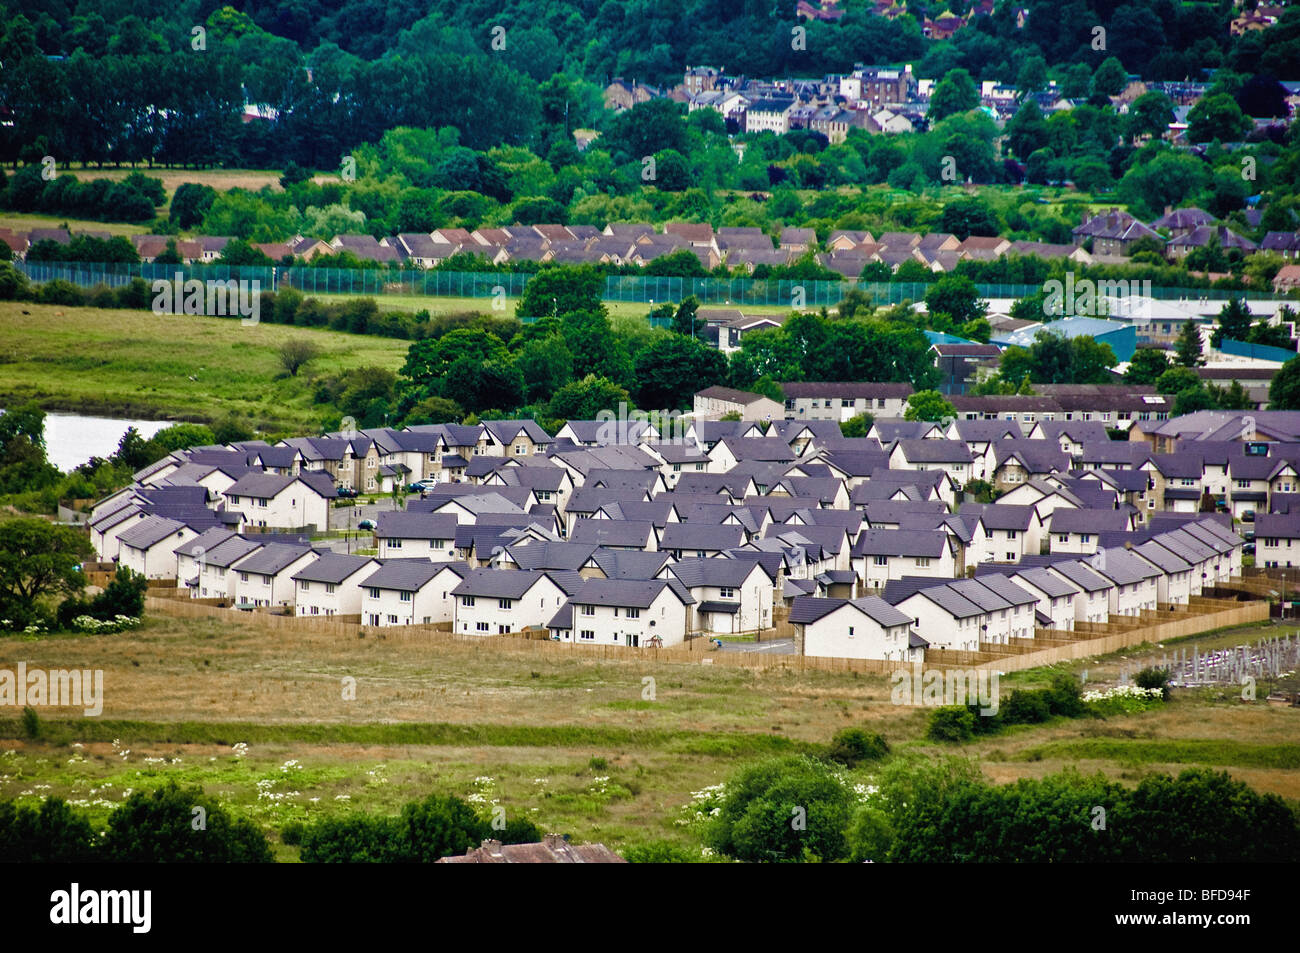 Aerial shot of housing estate near Stirling Castle. - Stock Image